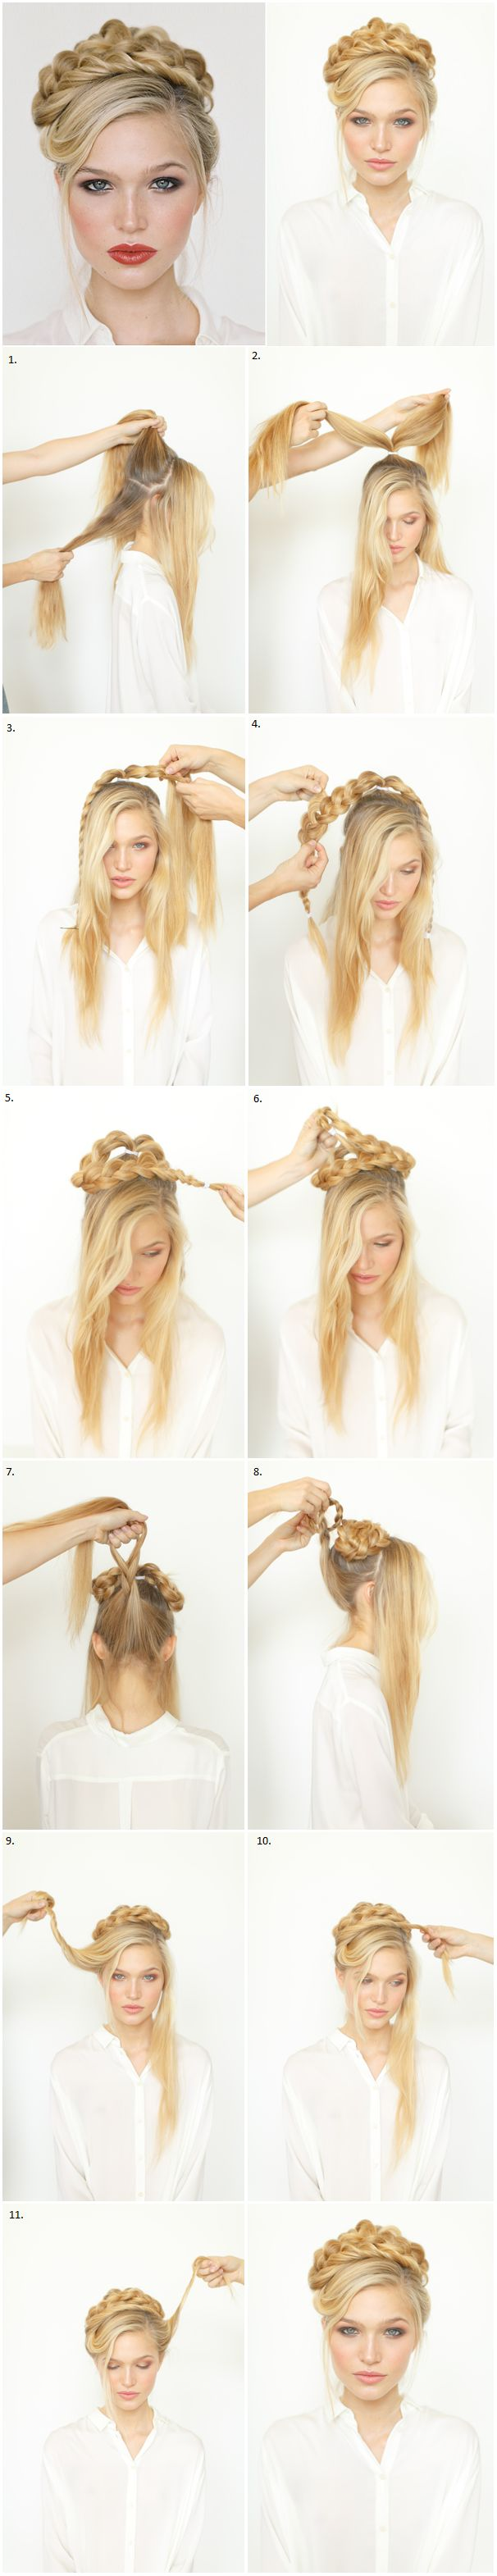 cuerda-trenza-boda-peinados-para-largo Hair1 (1)